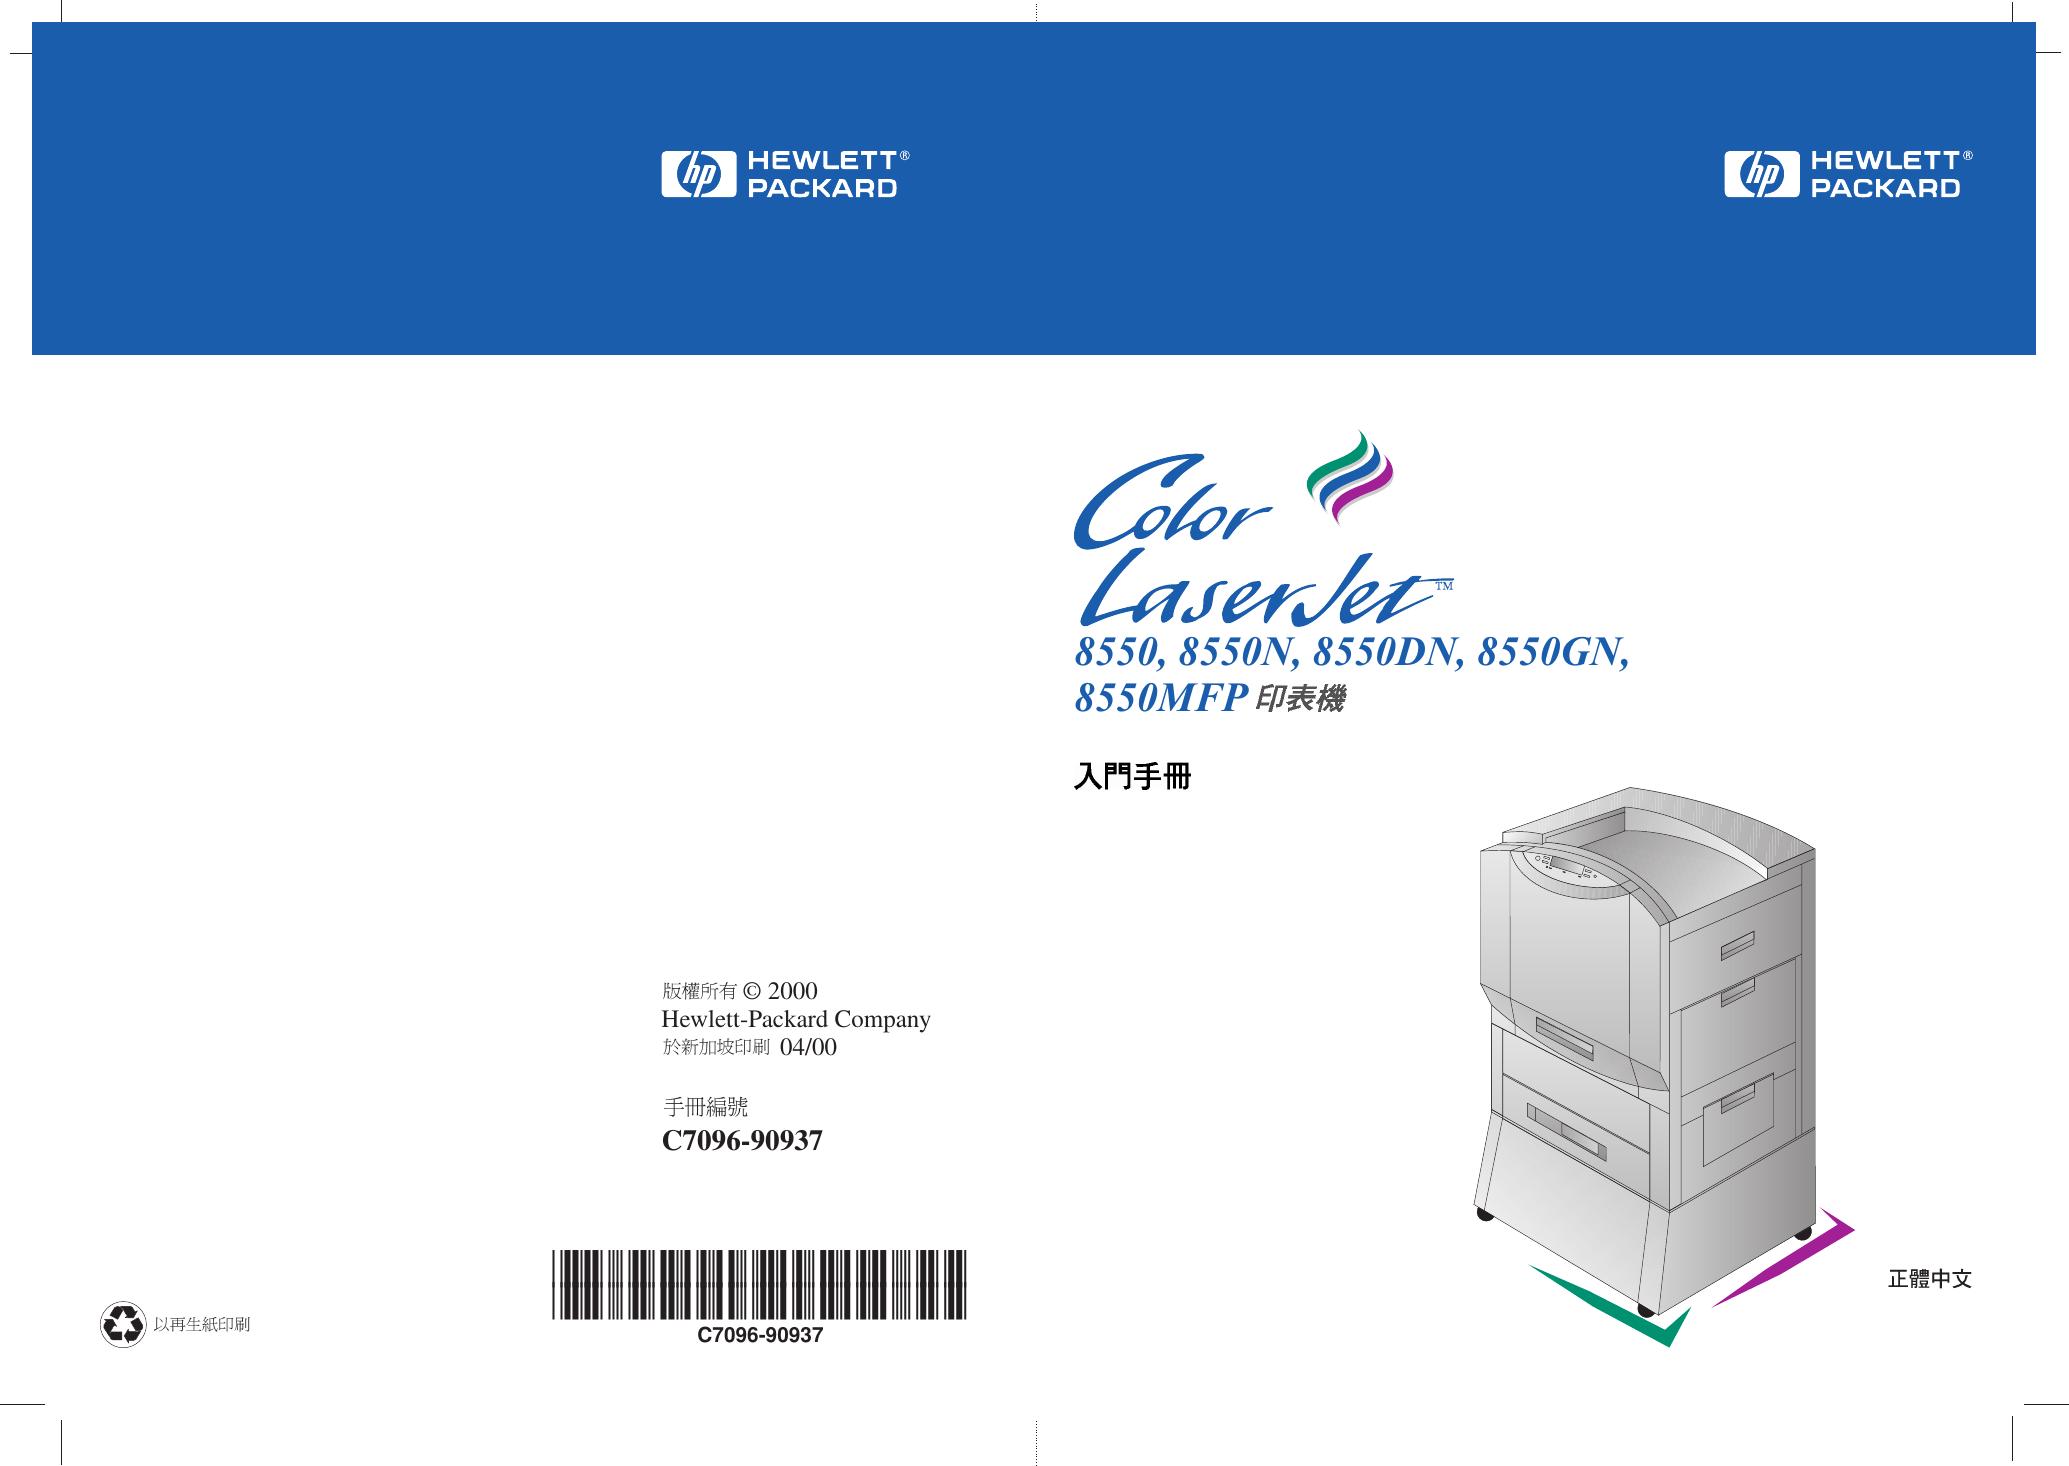 HP COLOR LASERJET 8550 PCL 5C DRIVERS FOR PC